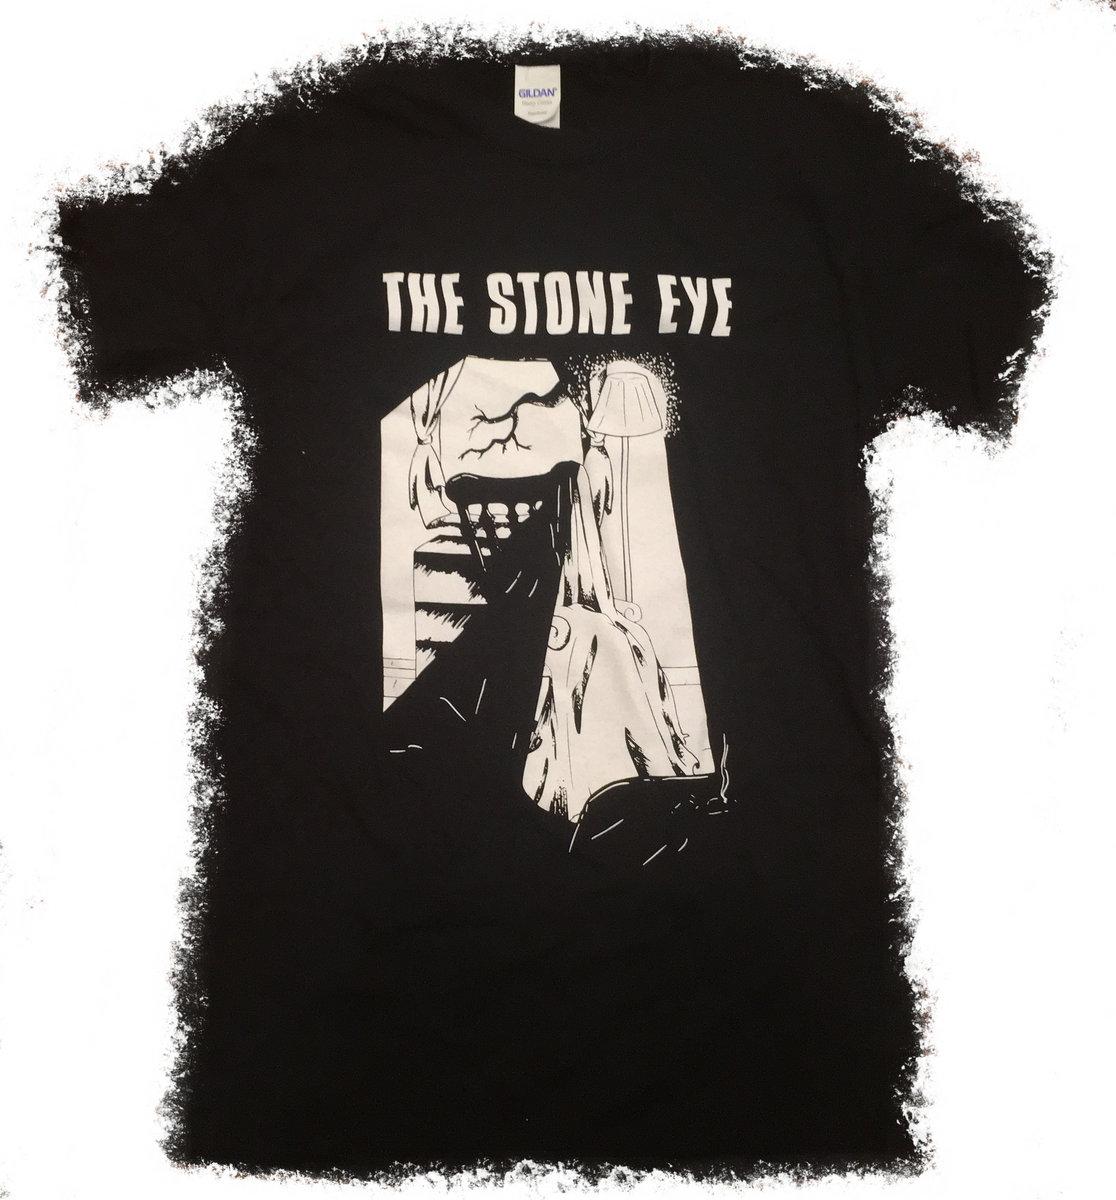 Rockinu0027 Chair  T-Shirt 2018 main photo ·    sc 1 st  The Stone Eye - Bandc& & Rockinu0027 Chair